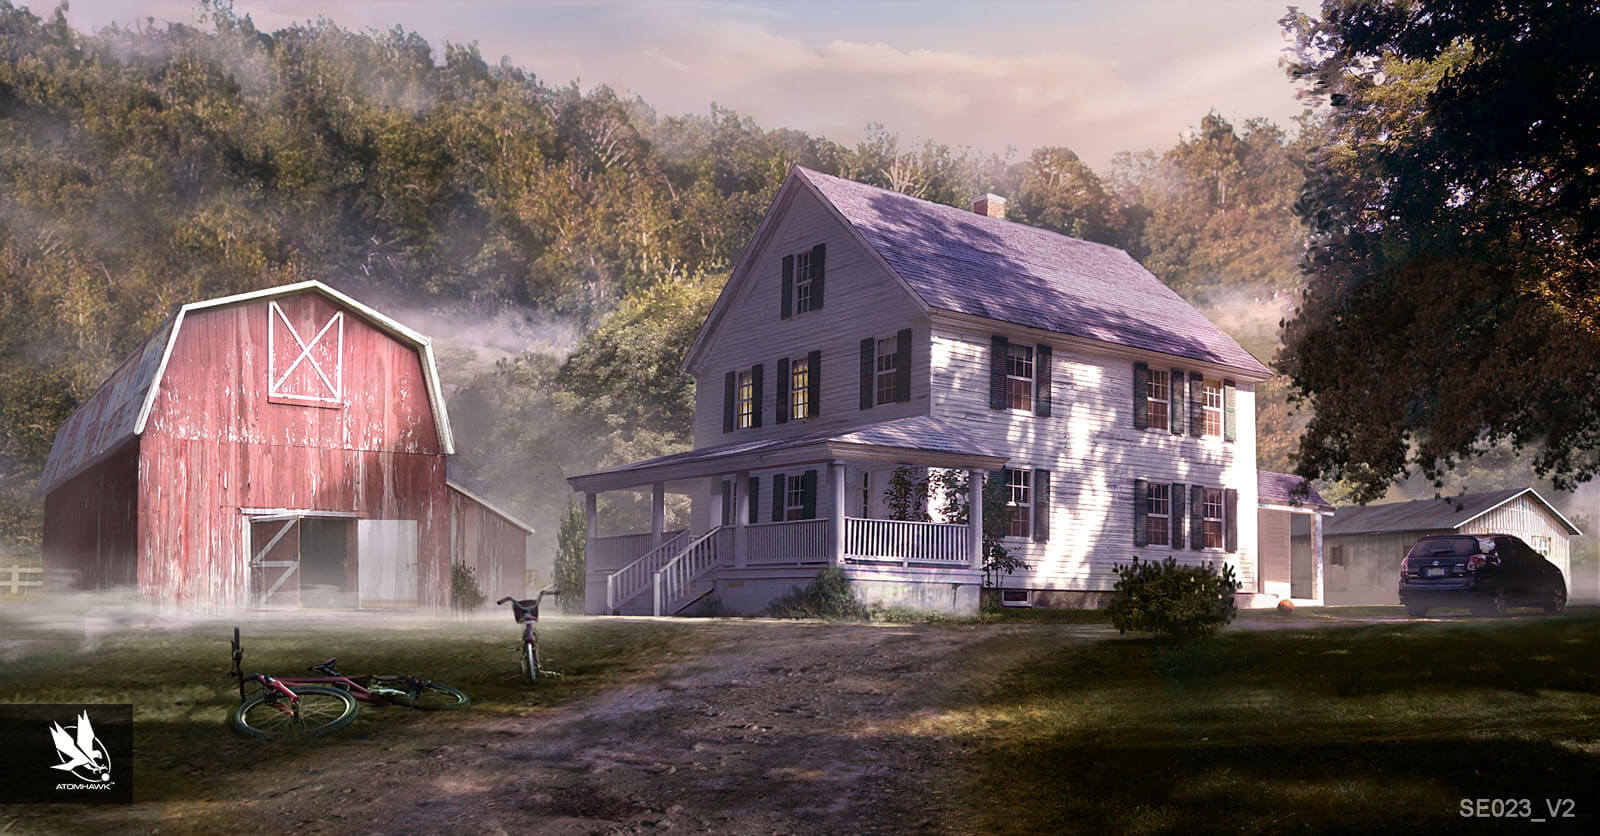 Atomhawk_Marvel_Avengers-Age-Of-Ultron_Concept-Art_Environment-Design_Hawkeyes-Farmhouse-V2_Services.jpg